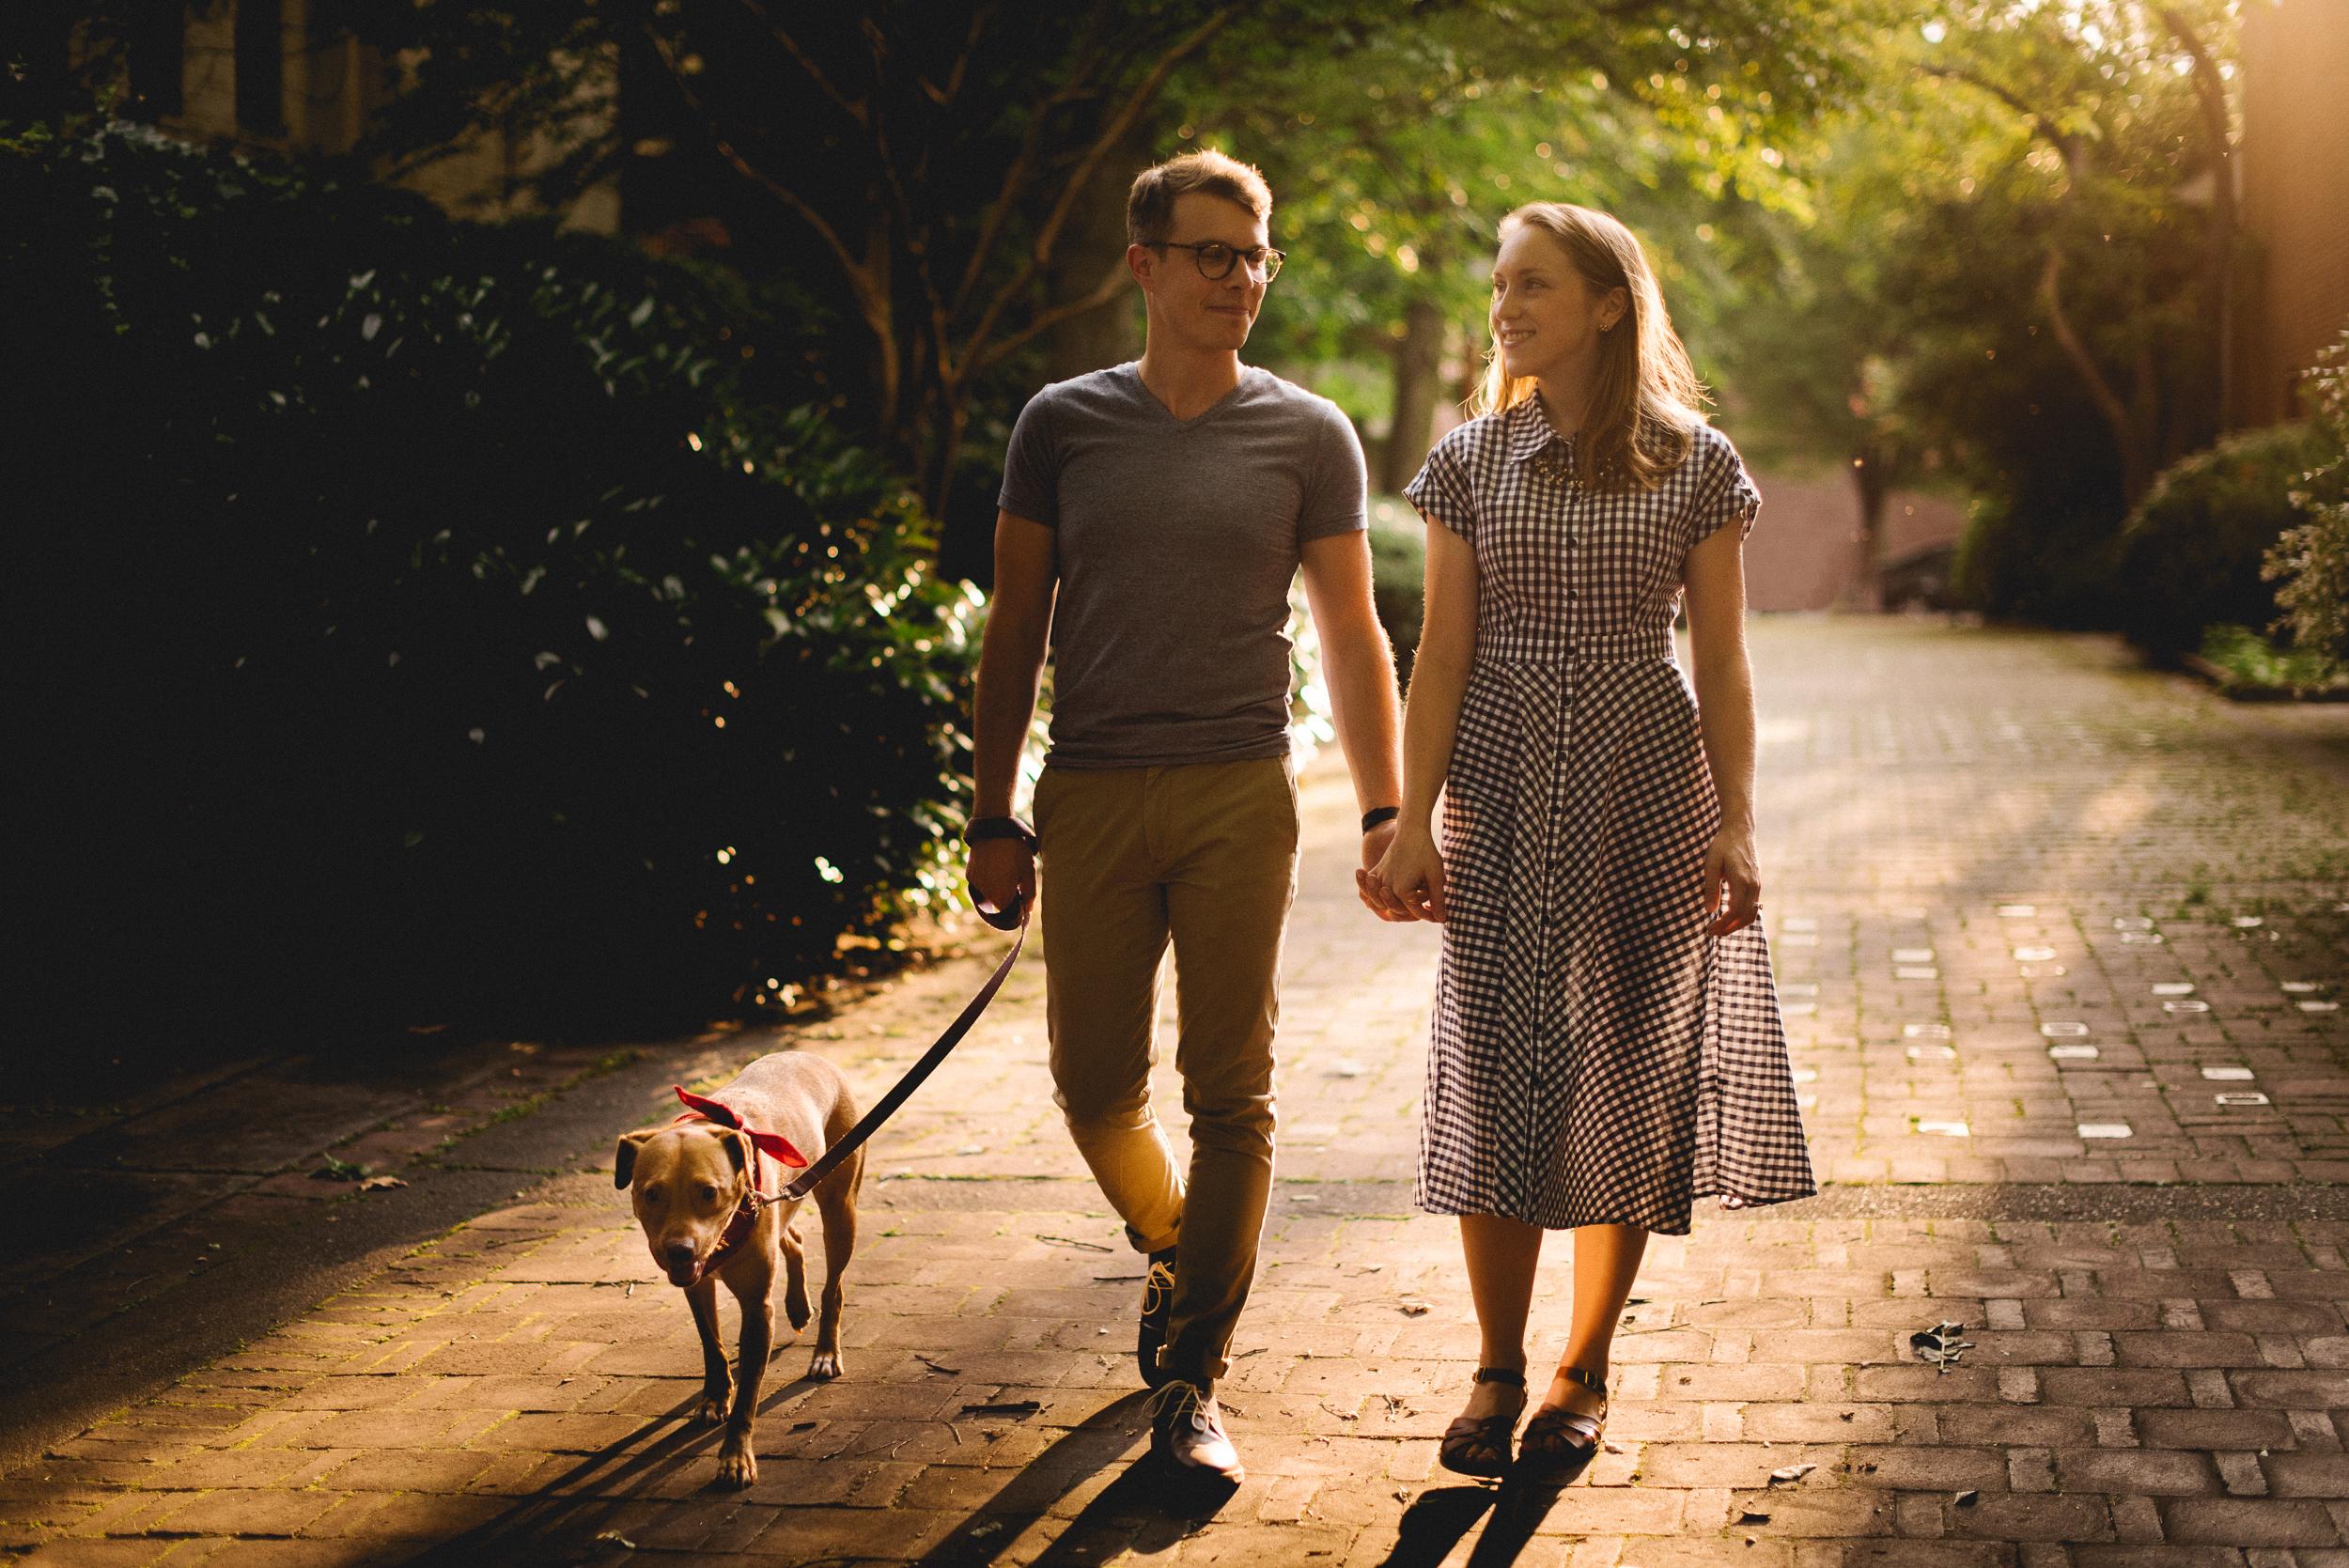 Peaberry-Photography-Society-Hill-Philadelphia-Pennsylvania-Newlyweds-Just-Married-031.jpg